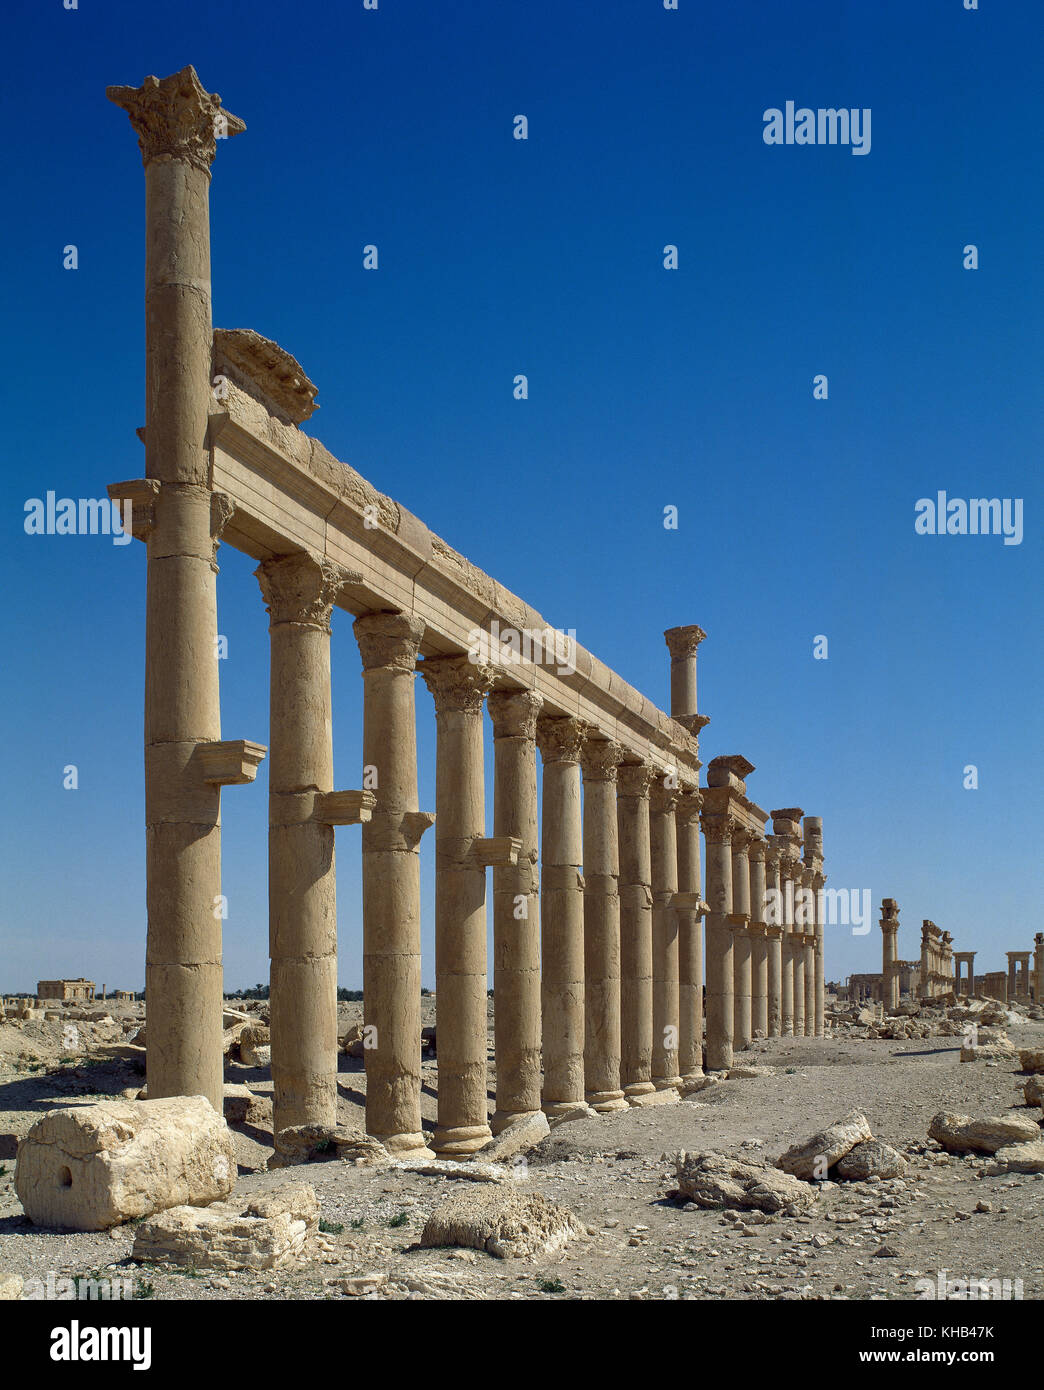 Syria. Palmyra city. The Great Colonnade. Roman Empire ruins. Tadmur, Homs. Photo before Syrian Civil War. Stock Photo